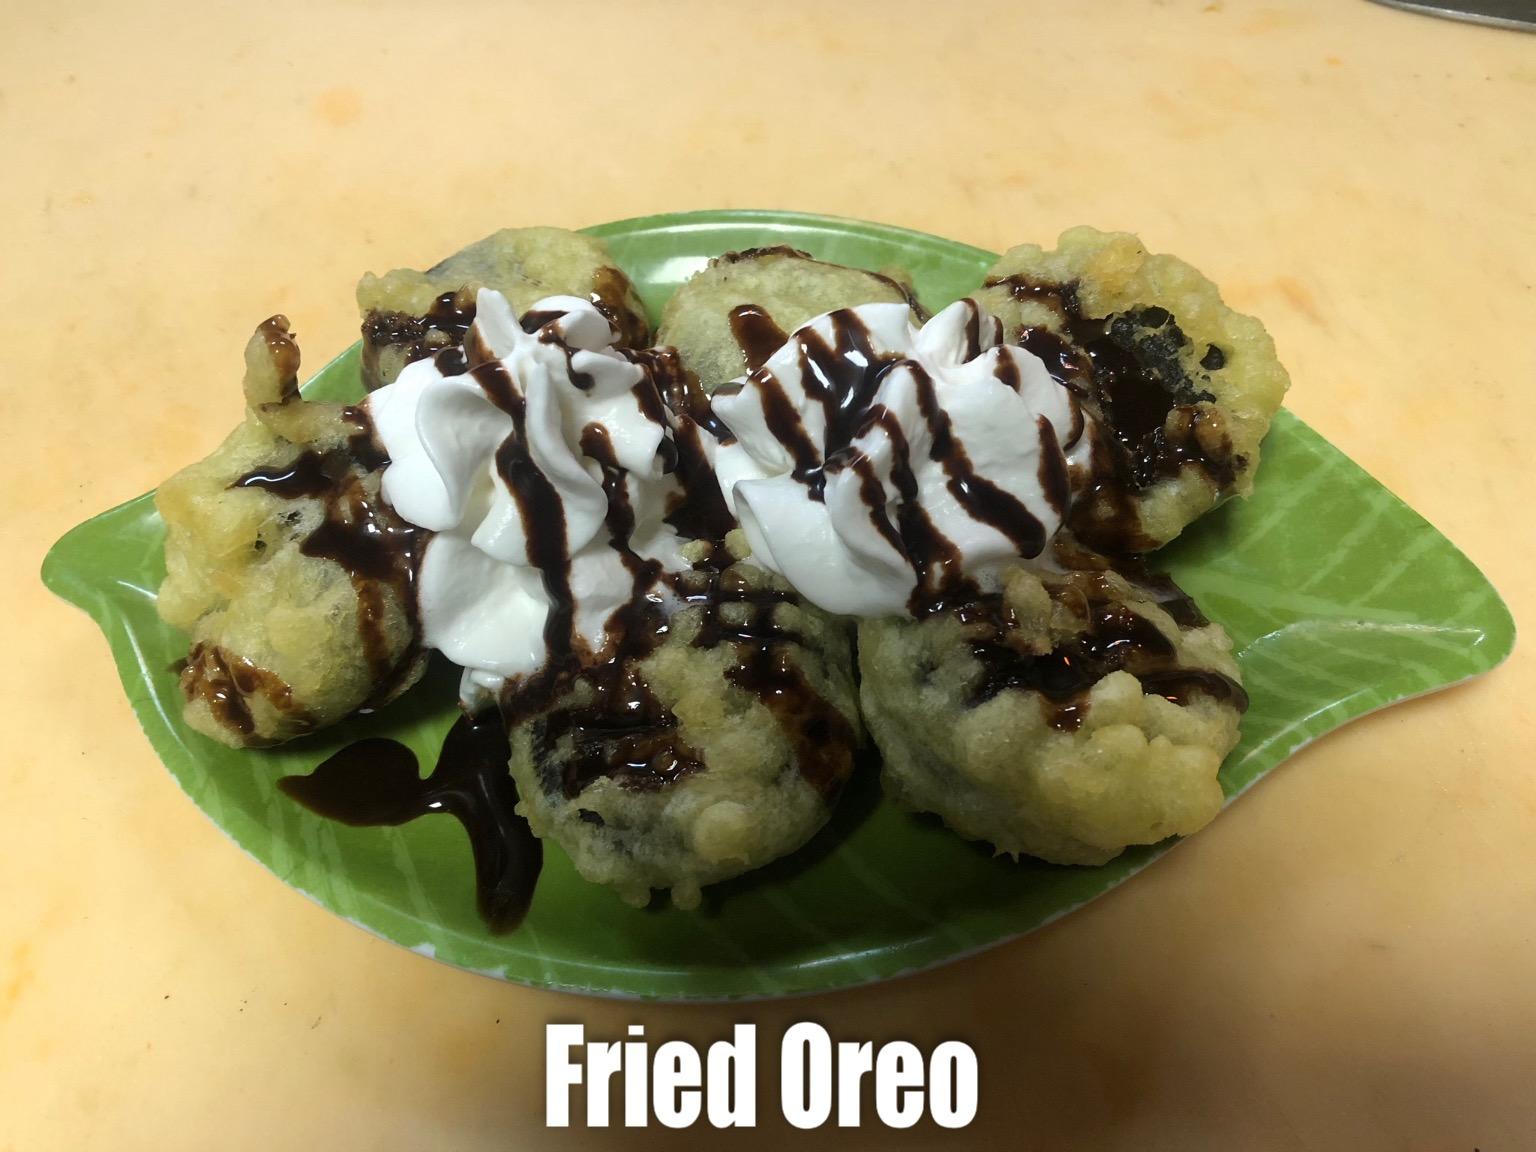 Fried Oreo